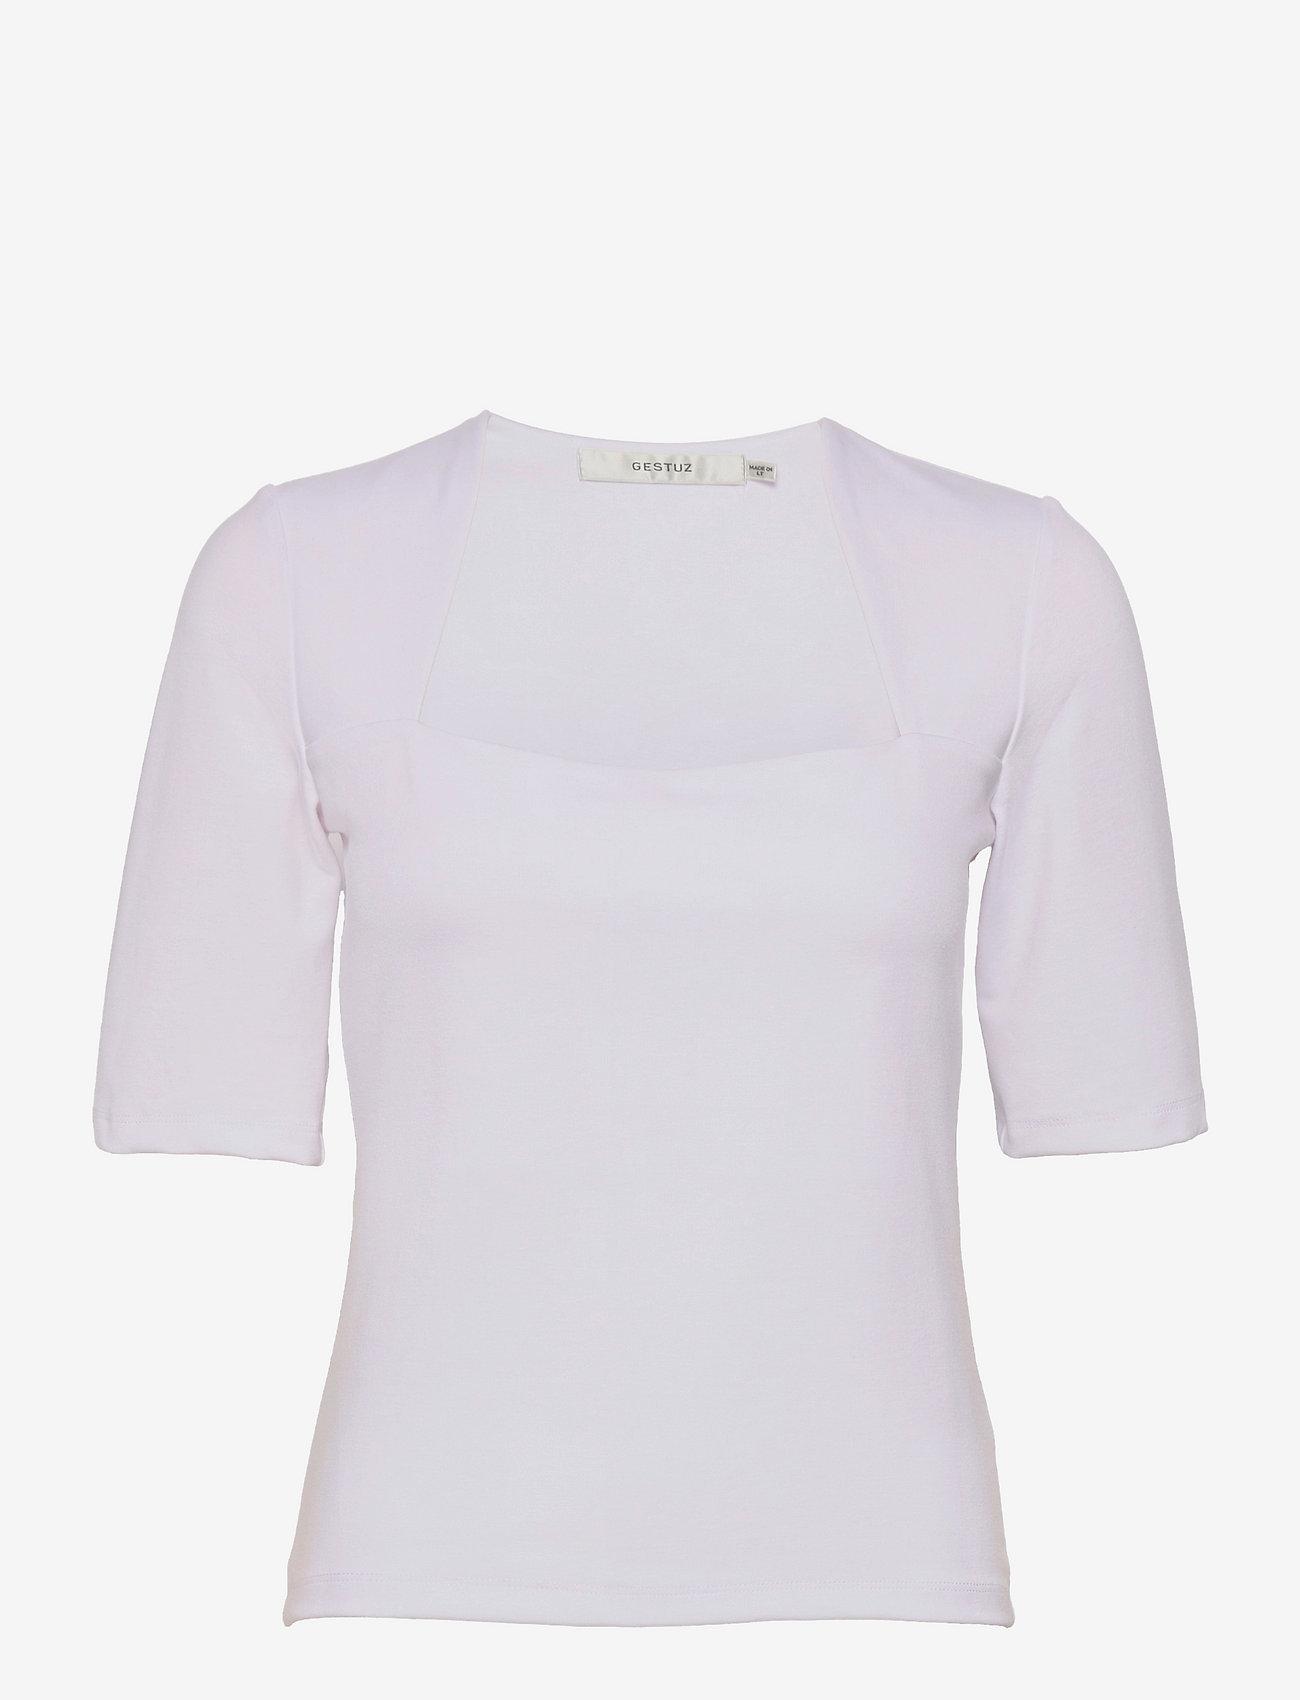 Gestuz - MalbaGZ squareneck tee - t-shirts - bright white - 1